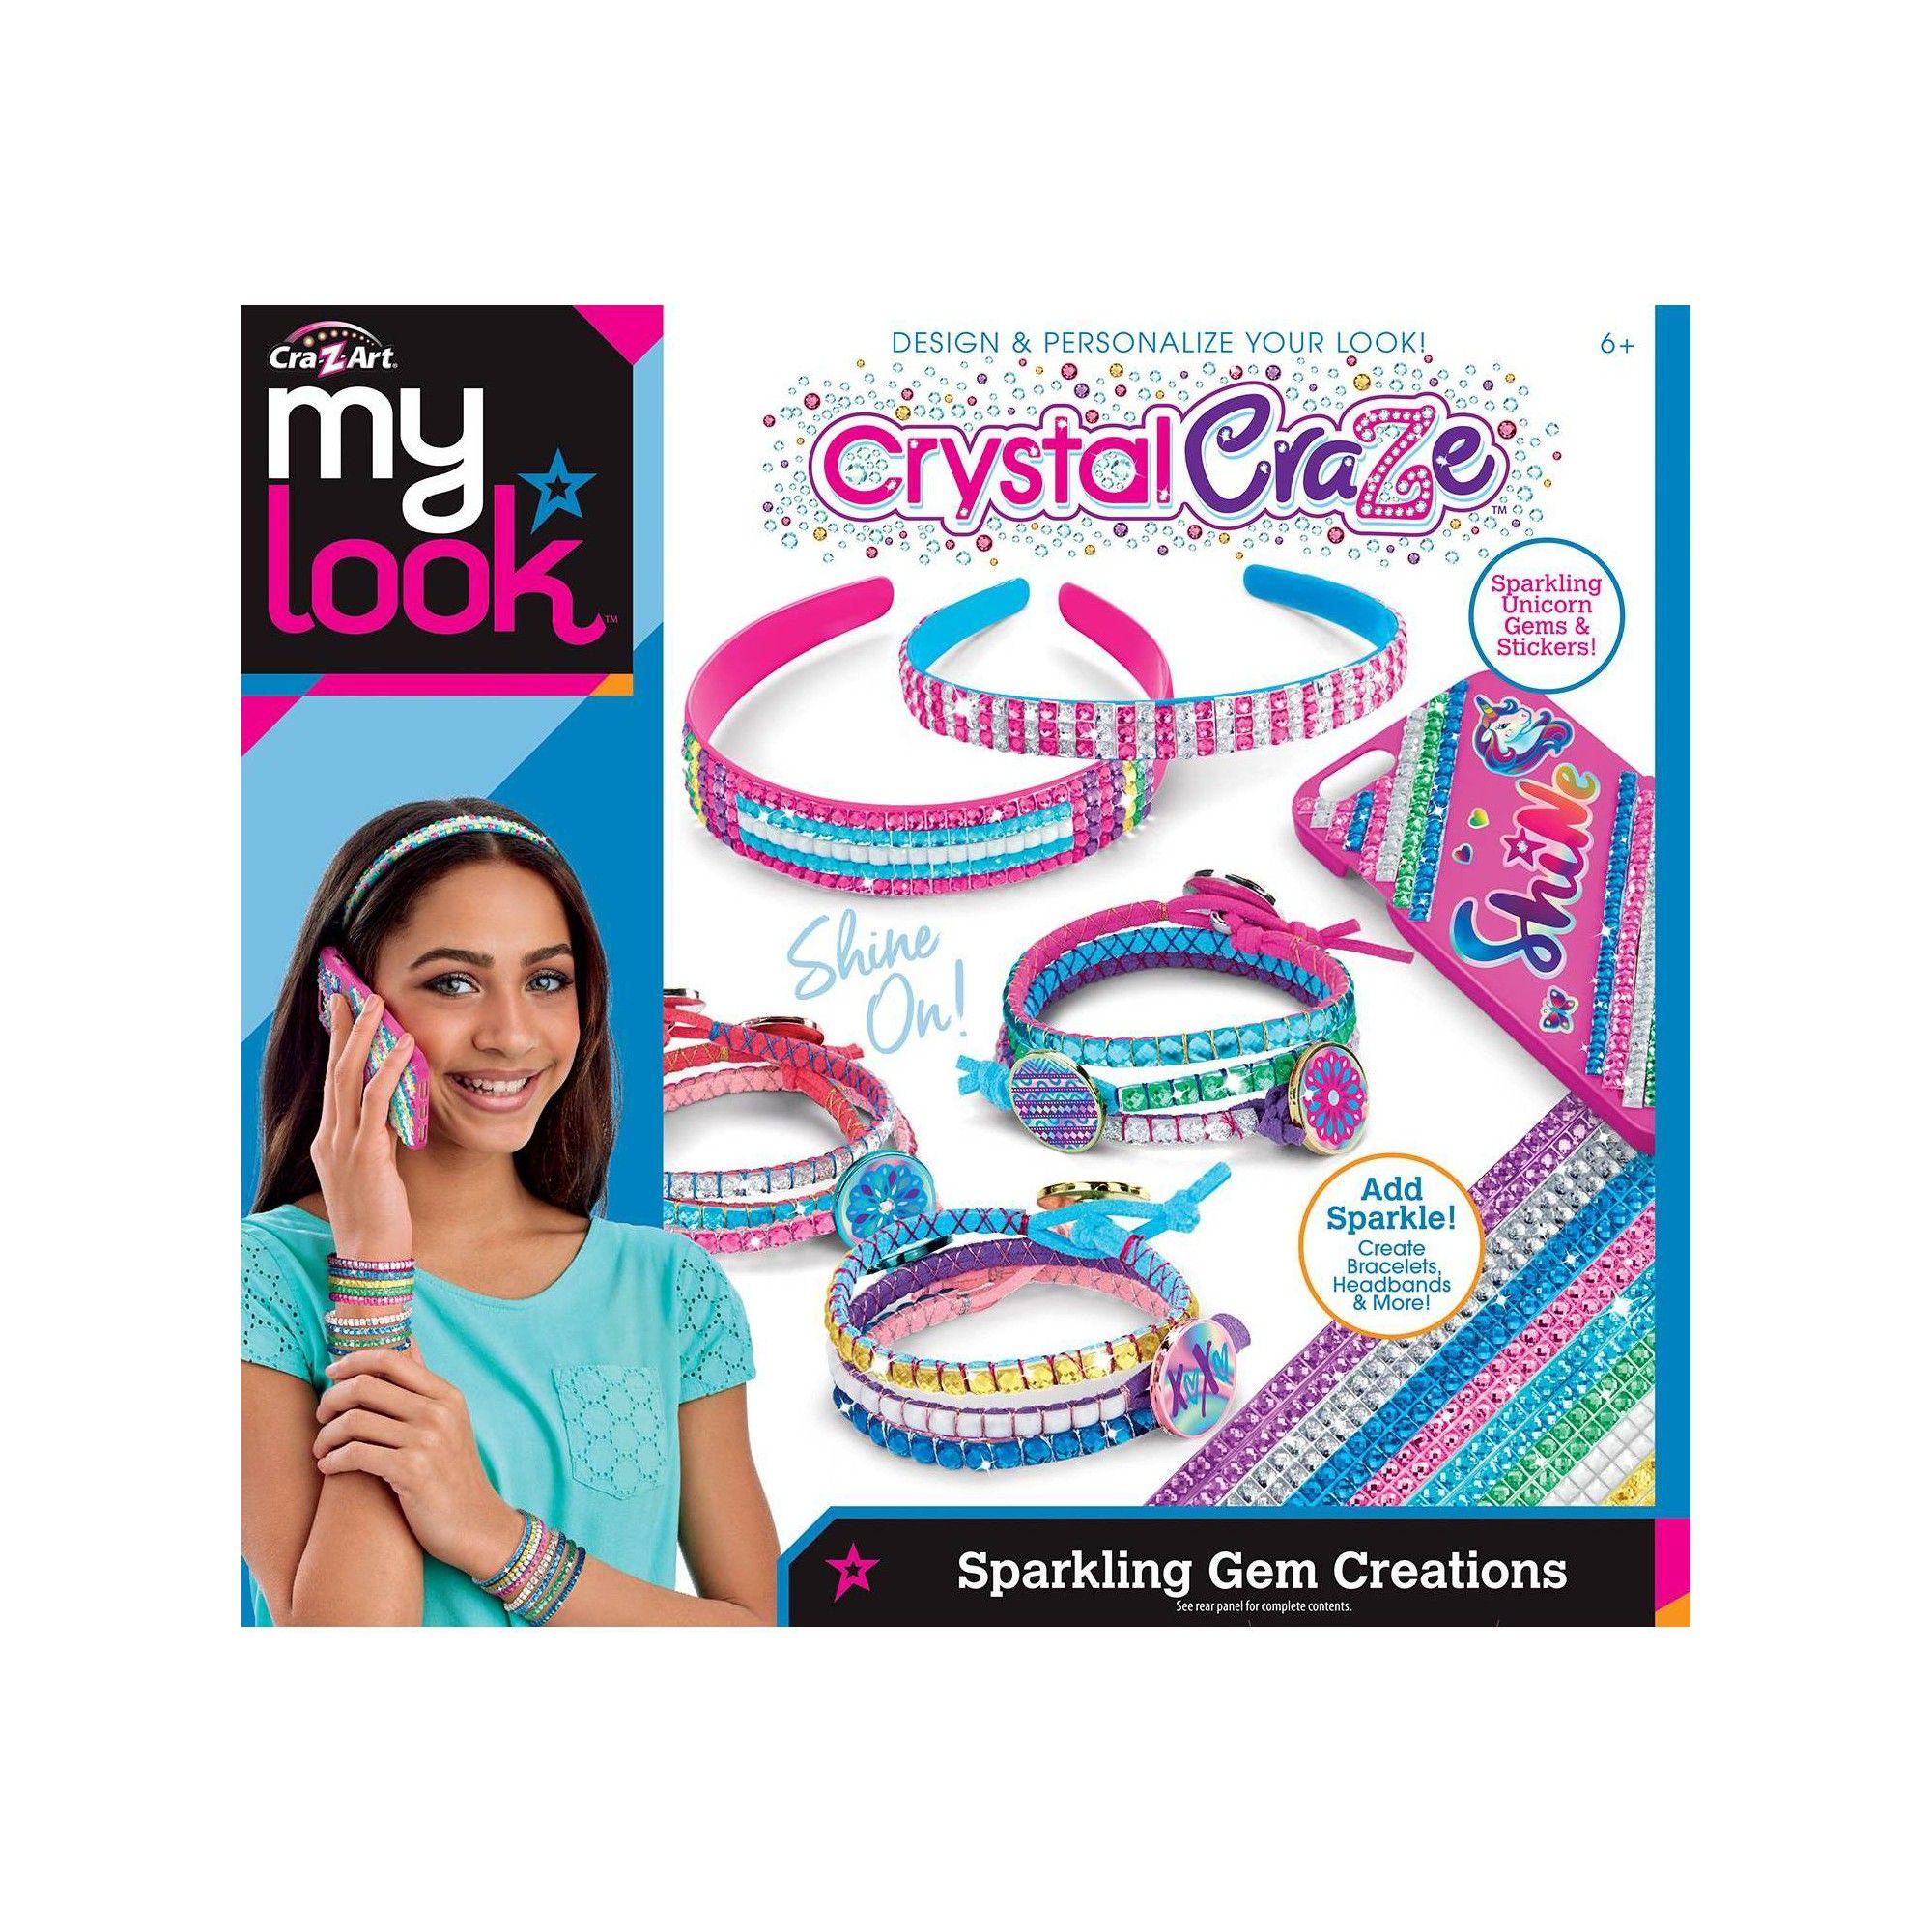 My Look Crystal Craze Sparkling Gem Creations By Cra Z Art Z Arts Pretty Headbands Stylish Stickers